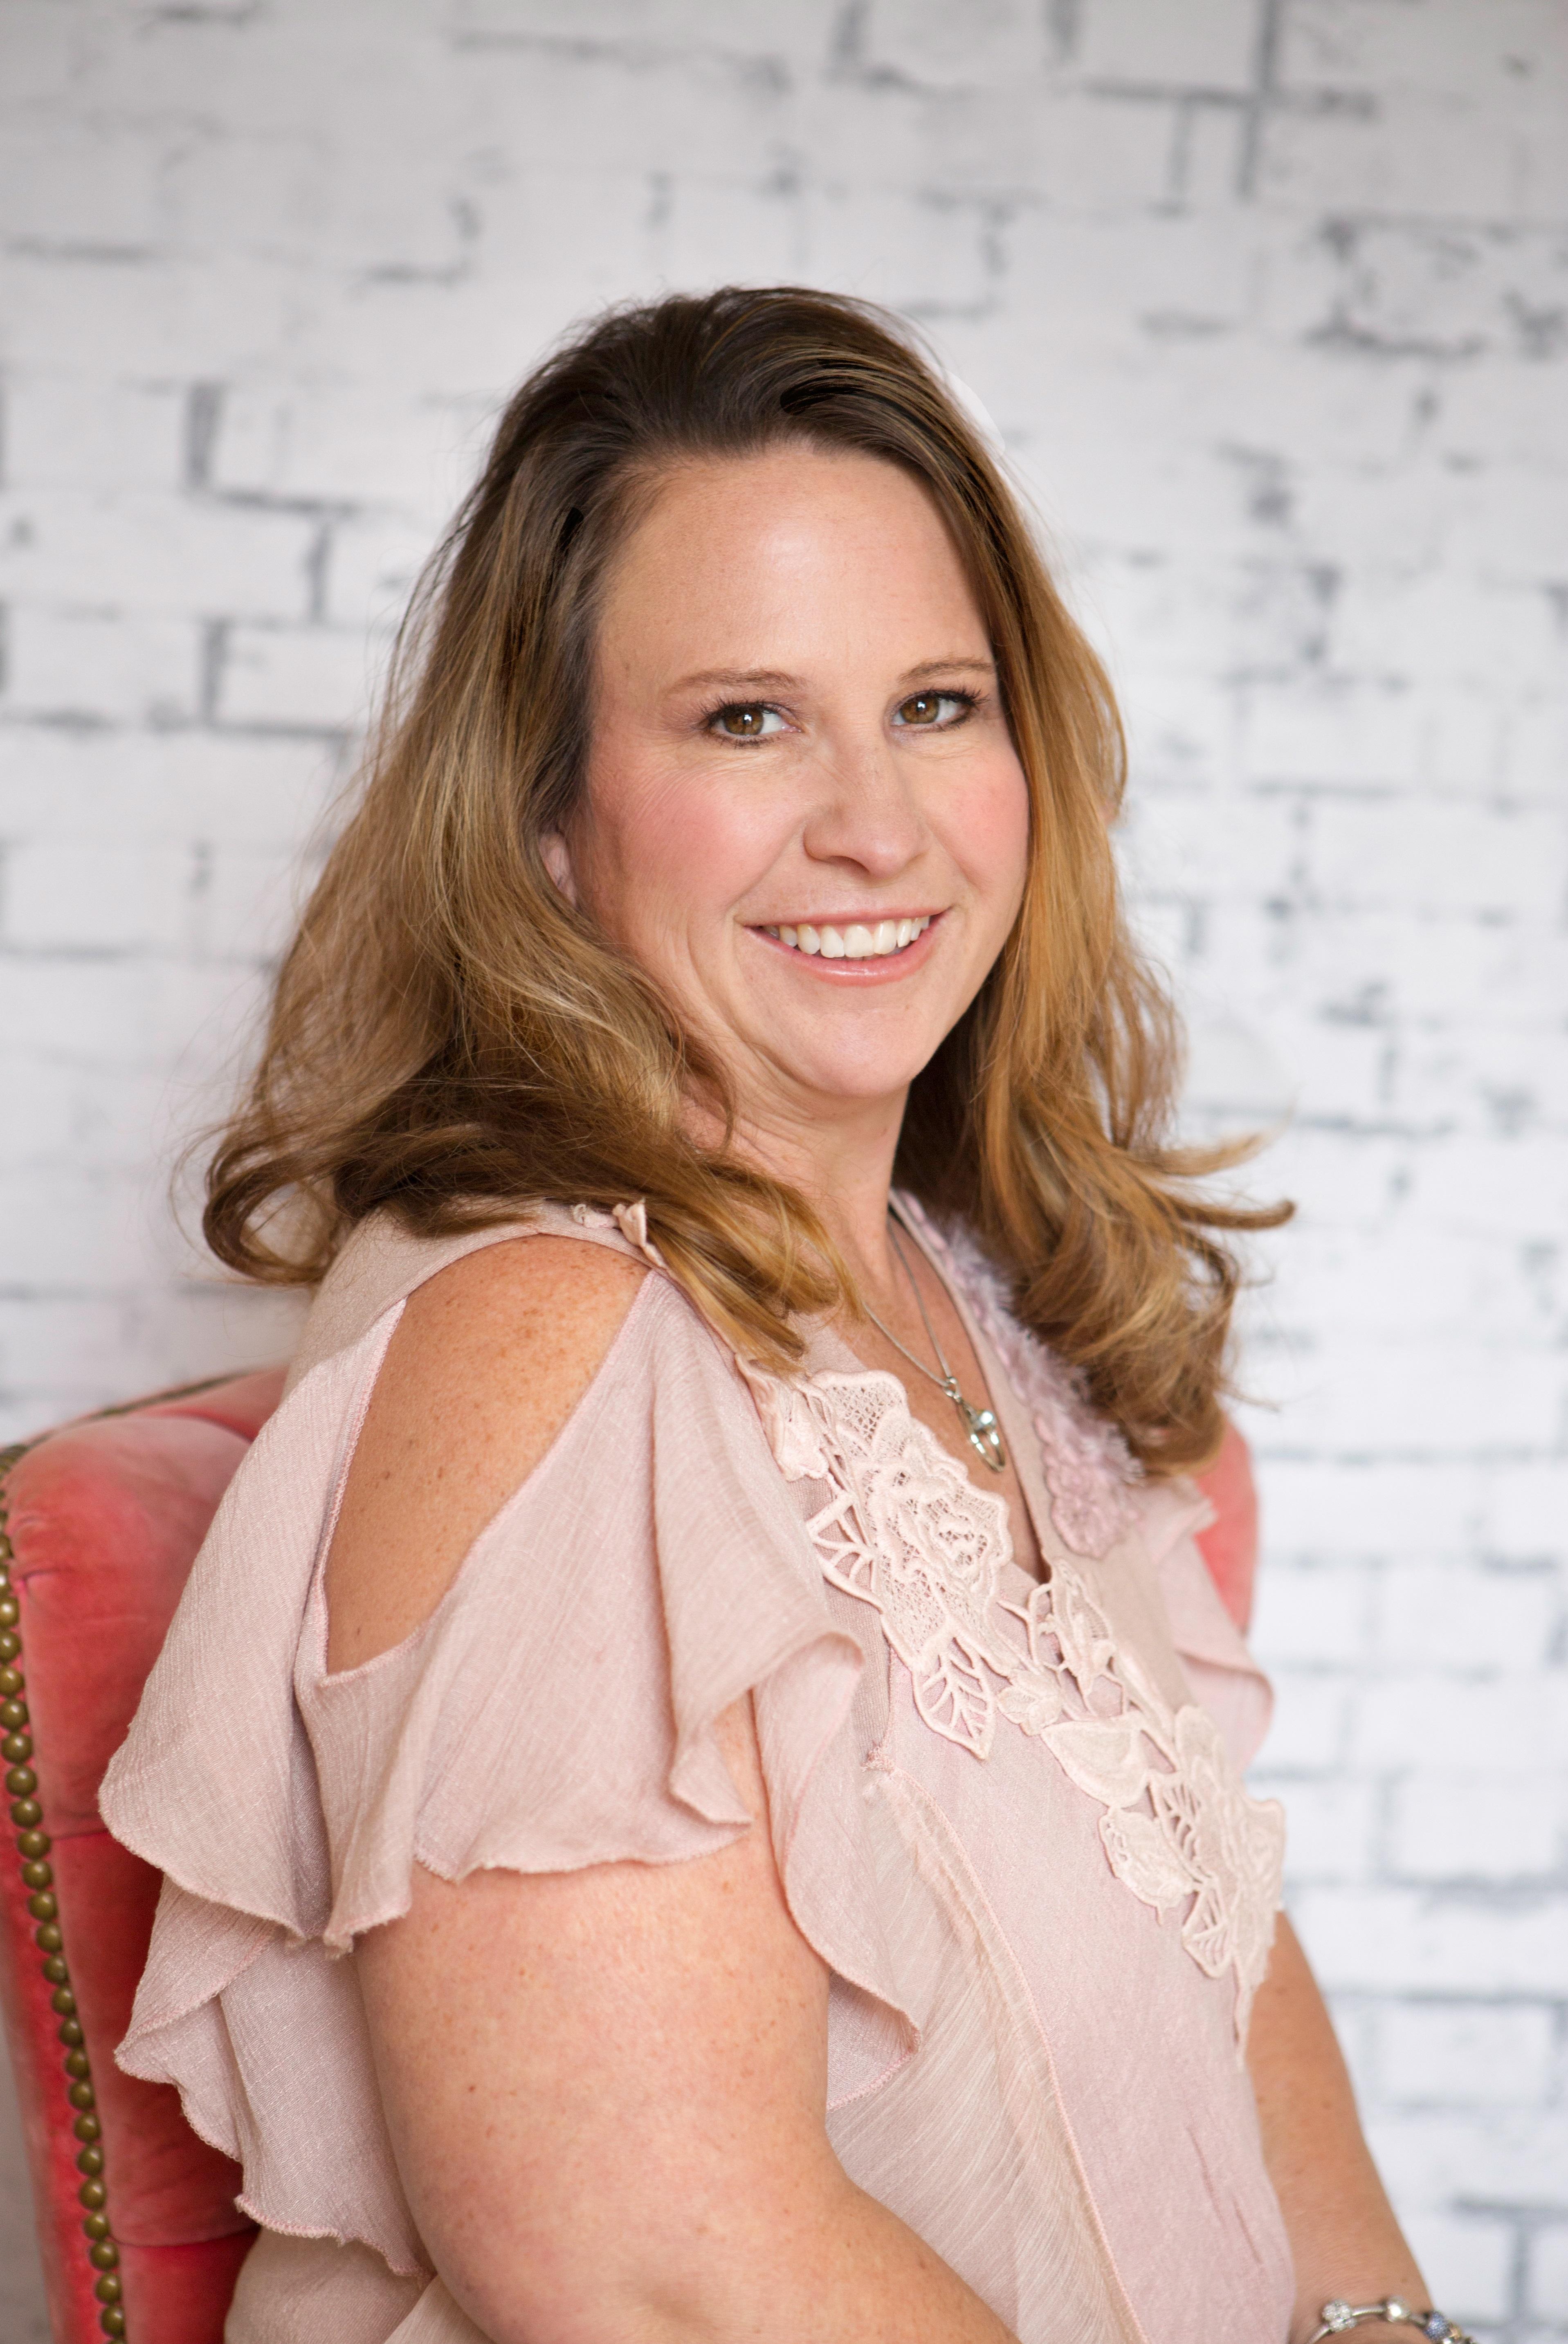 Tania Riedel